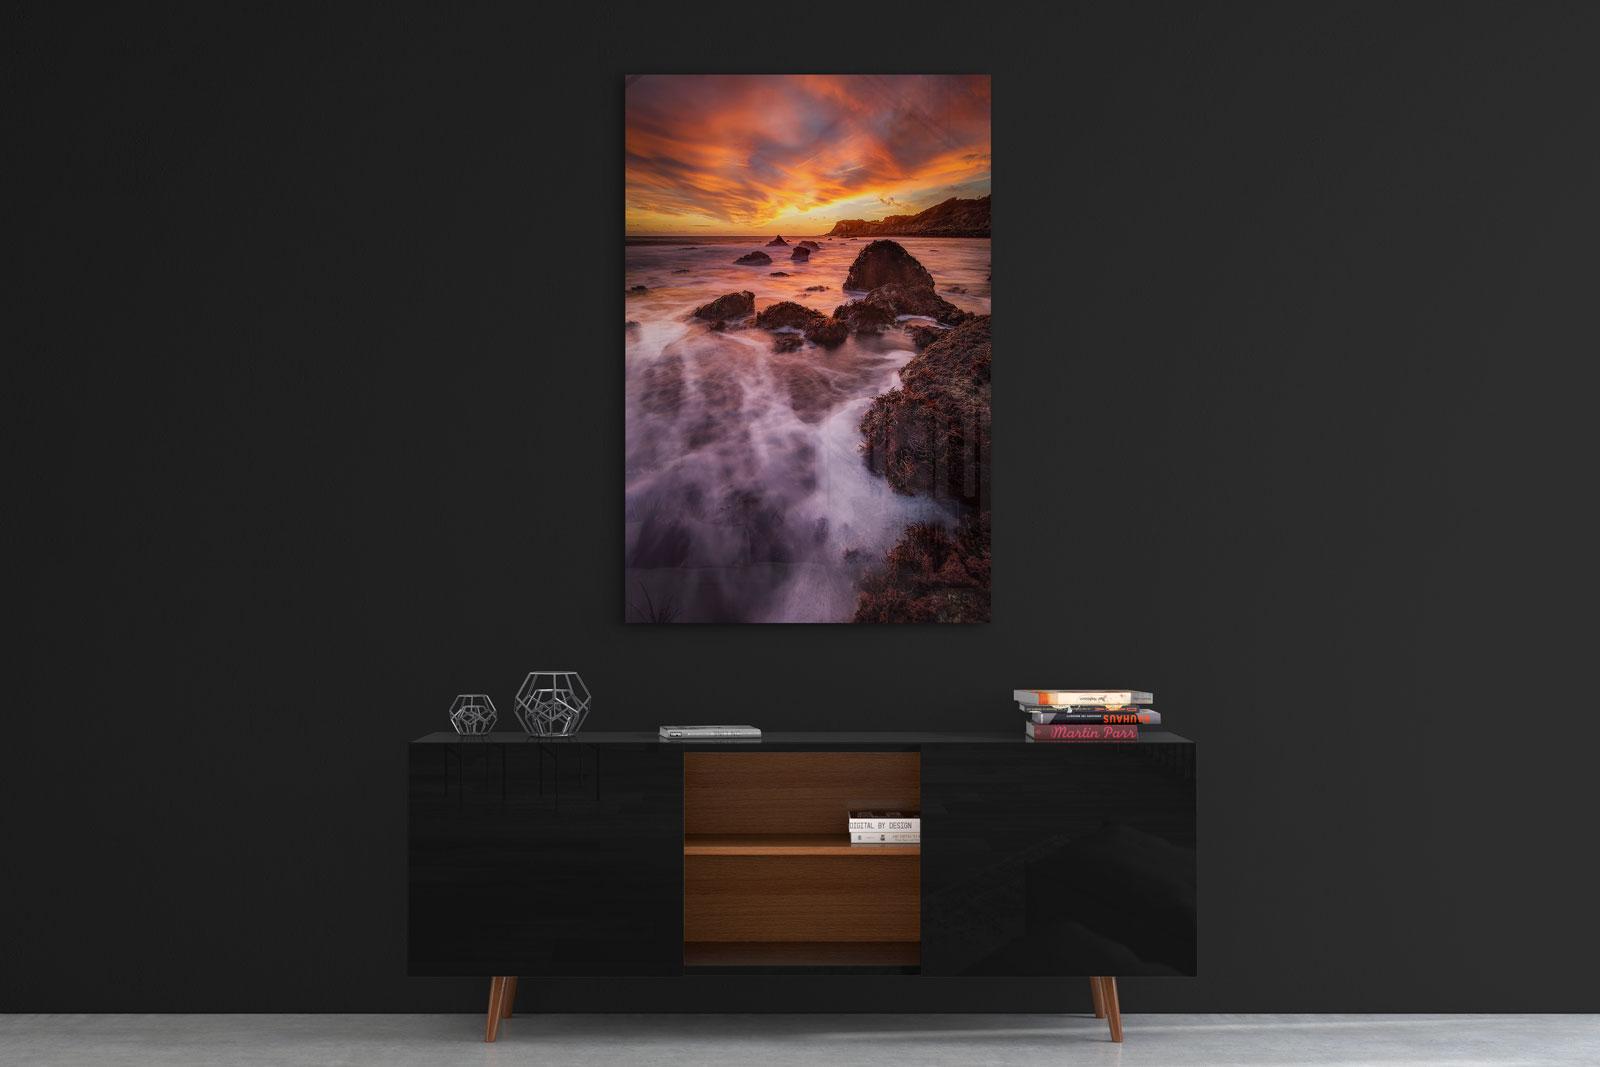 Mount-Bay-Sunset.jpg